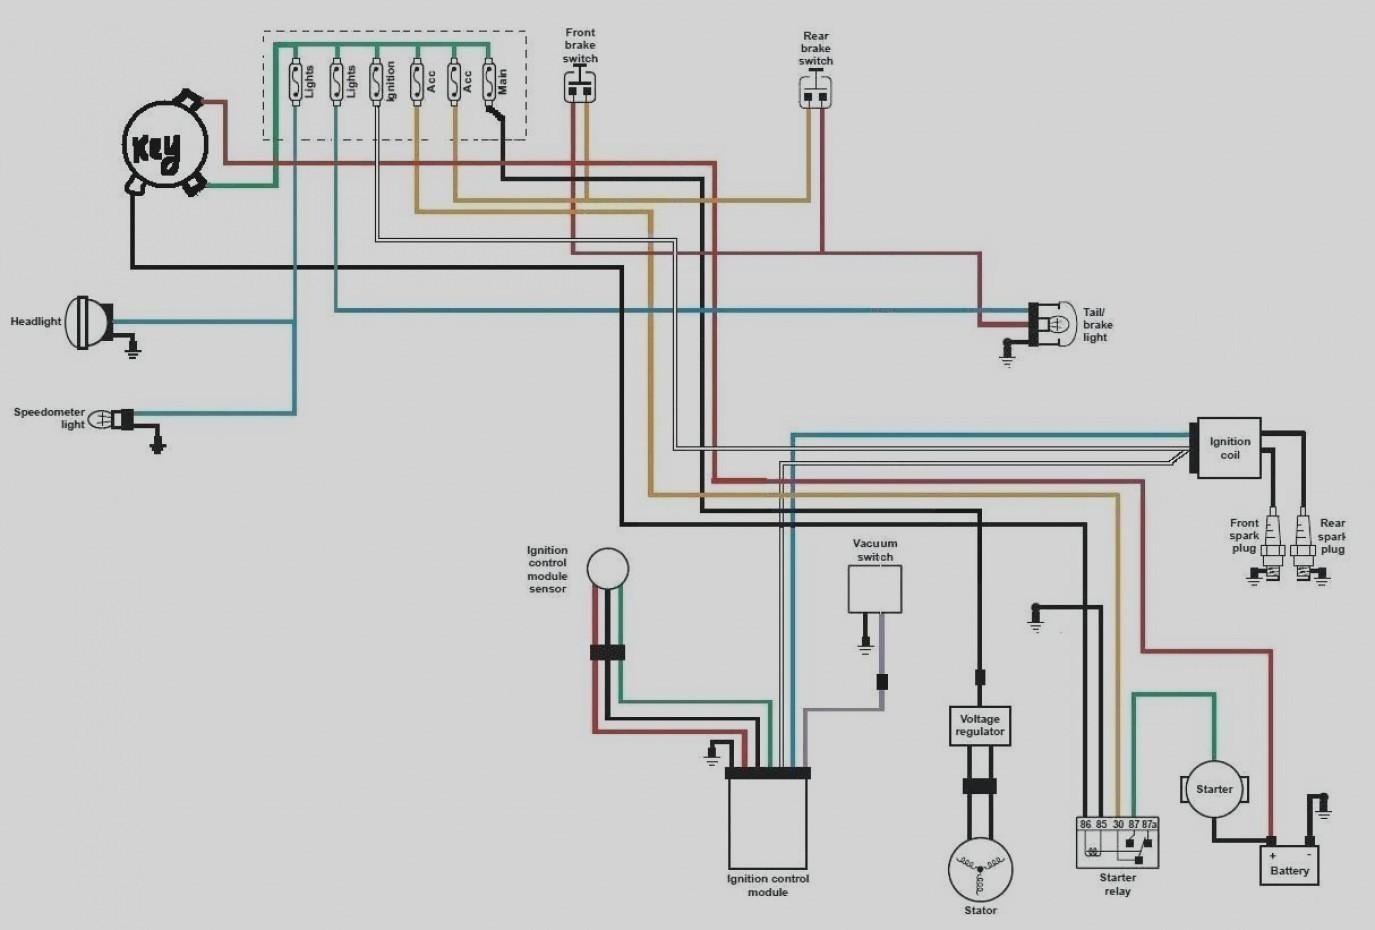 87 Fxr Wiring Diagram Wiring Diagram Go 1980 Shovelhead Wiring Diagram